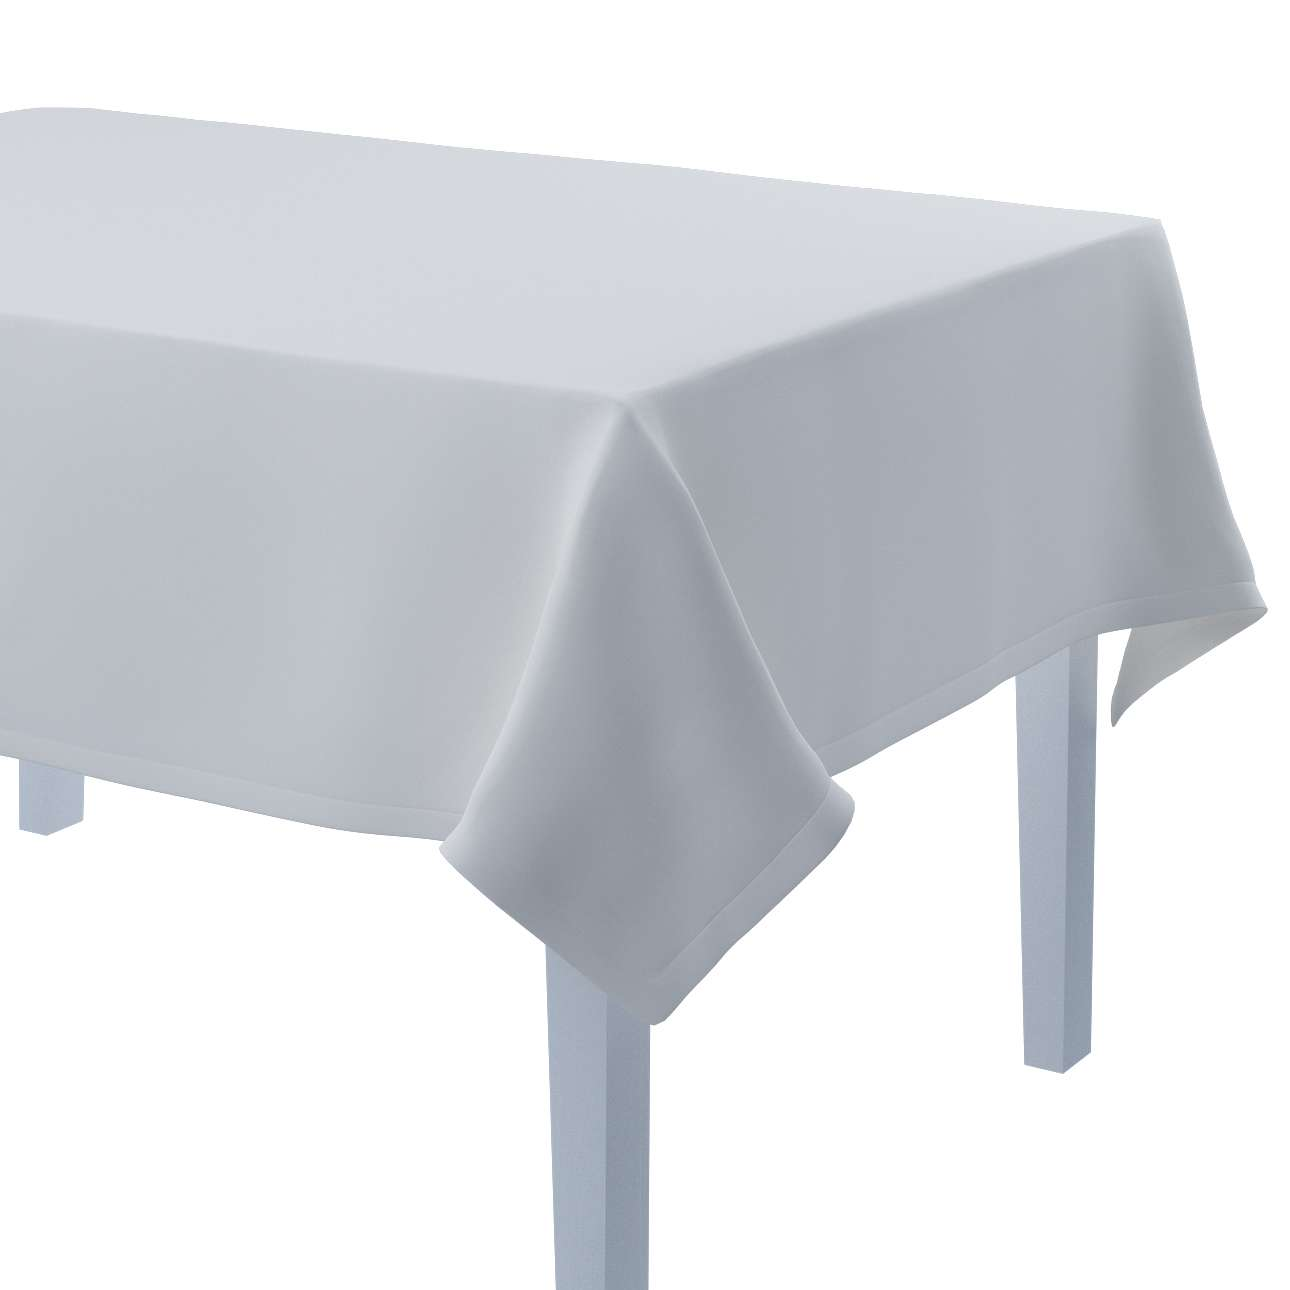 Staltiesės (stalui su kampais) 130 x 130 cm kolekcijoje Comics Prints, audinys: 139-00